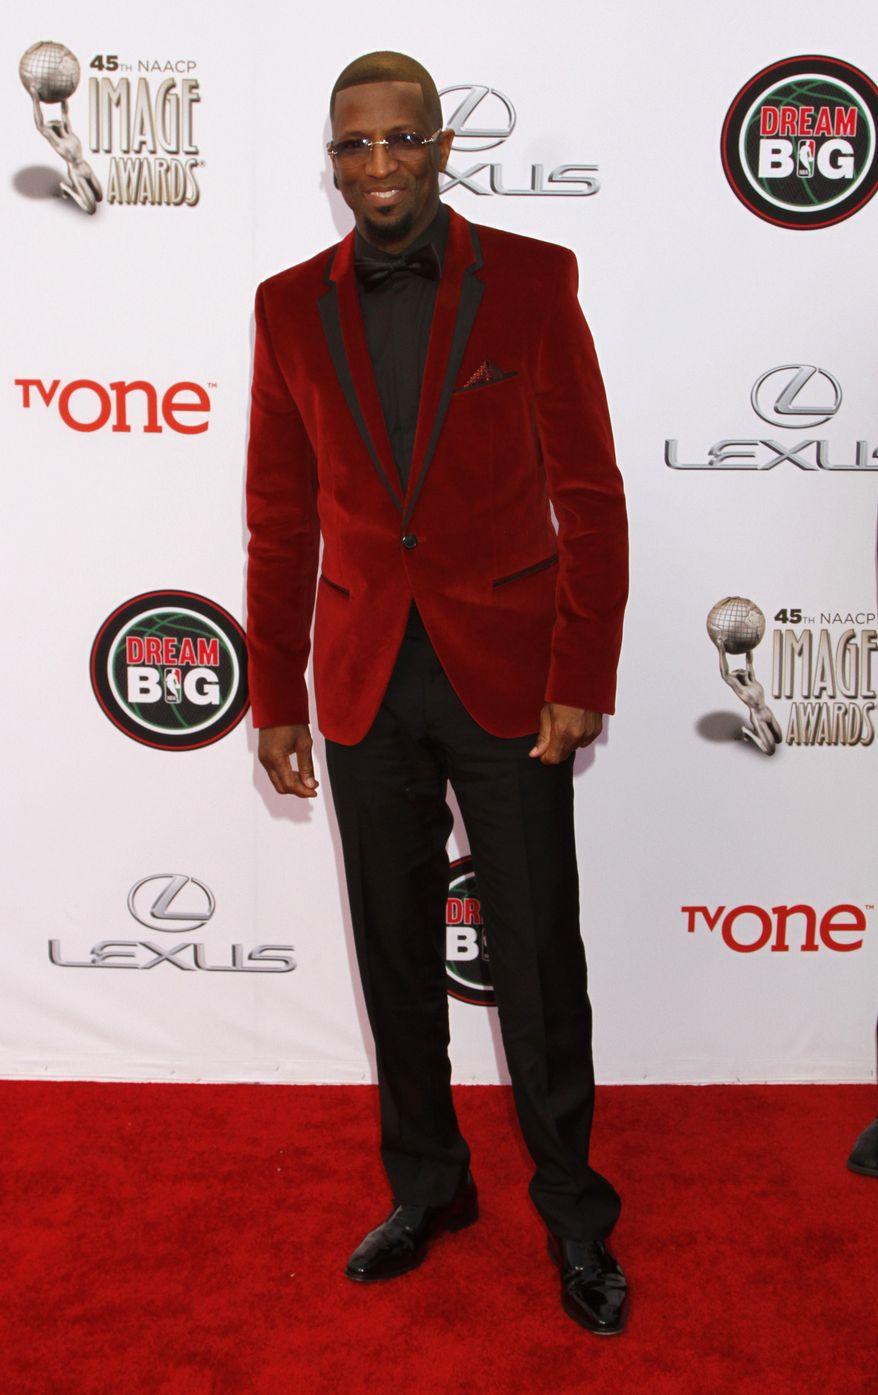 Rickey Smiley arrives at the 45th NAACP Image Awards at the Pasadena Civic Auditorium on Saturday, Feb. 22, 2014, in Pasadena, Calif. (Photo by Arnold Turner/Invision/AP) ** FILE **